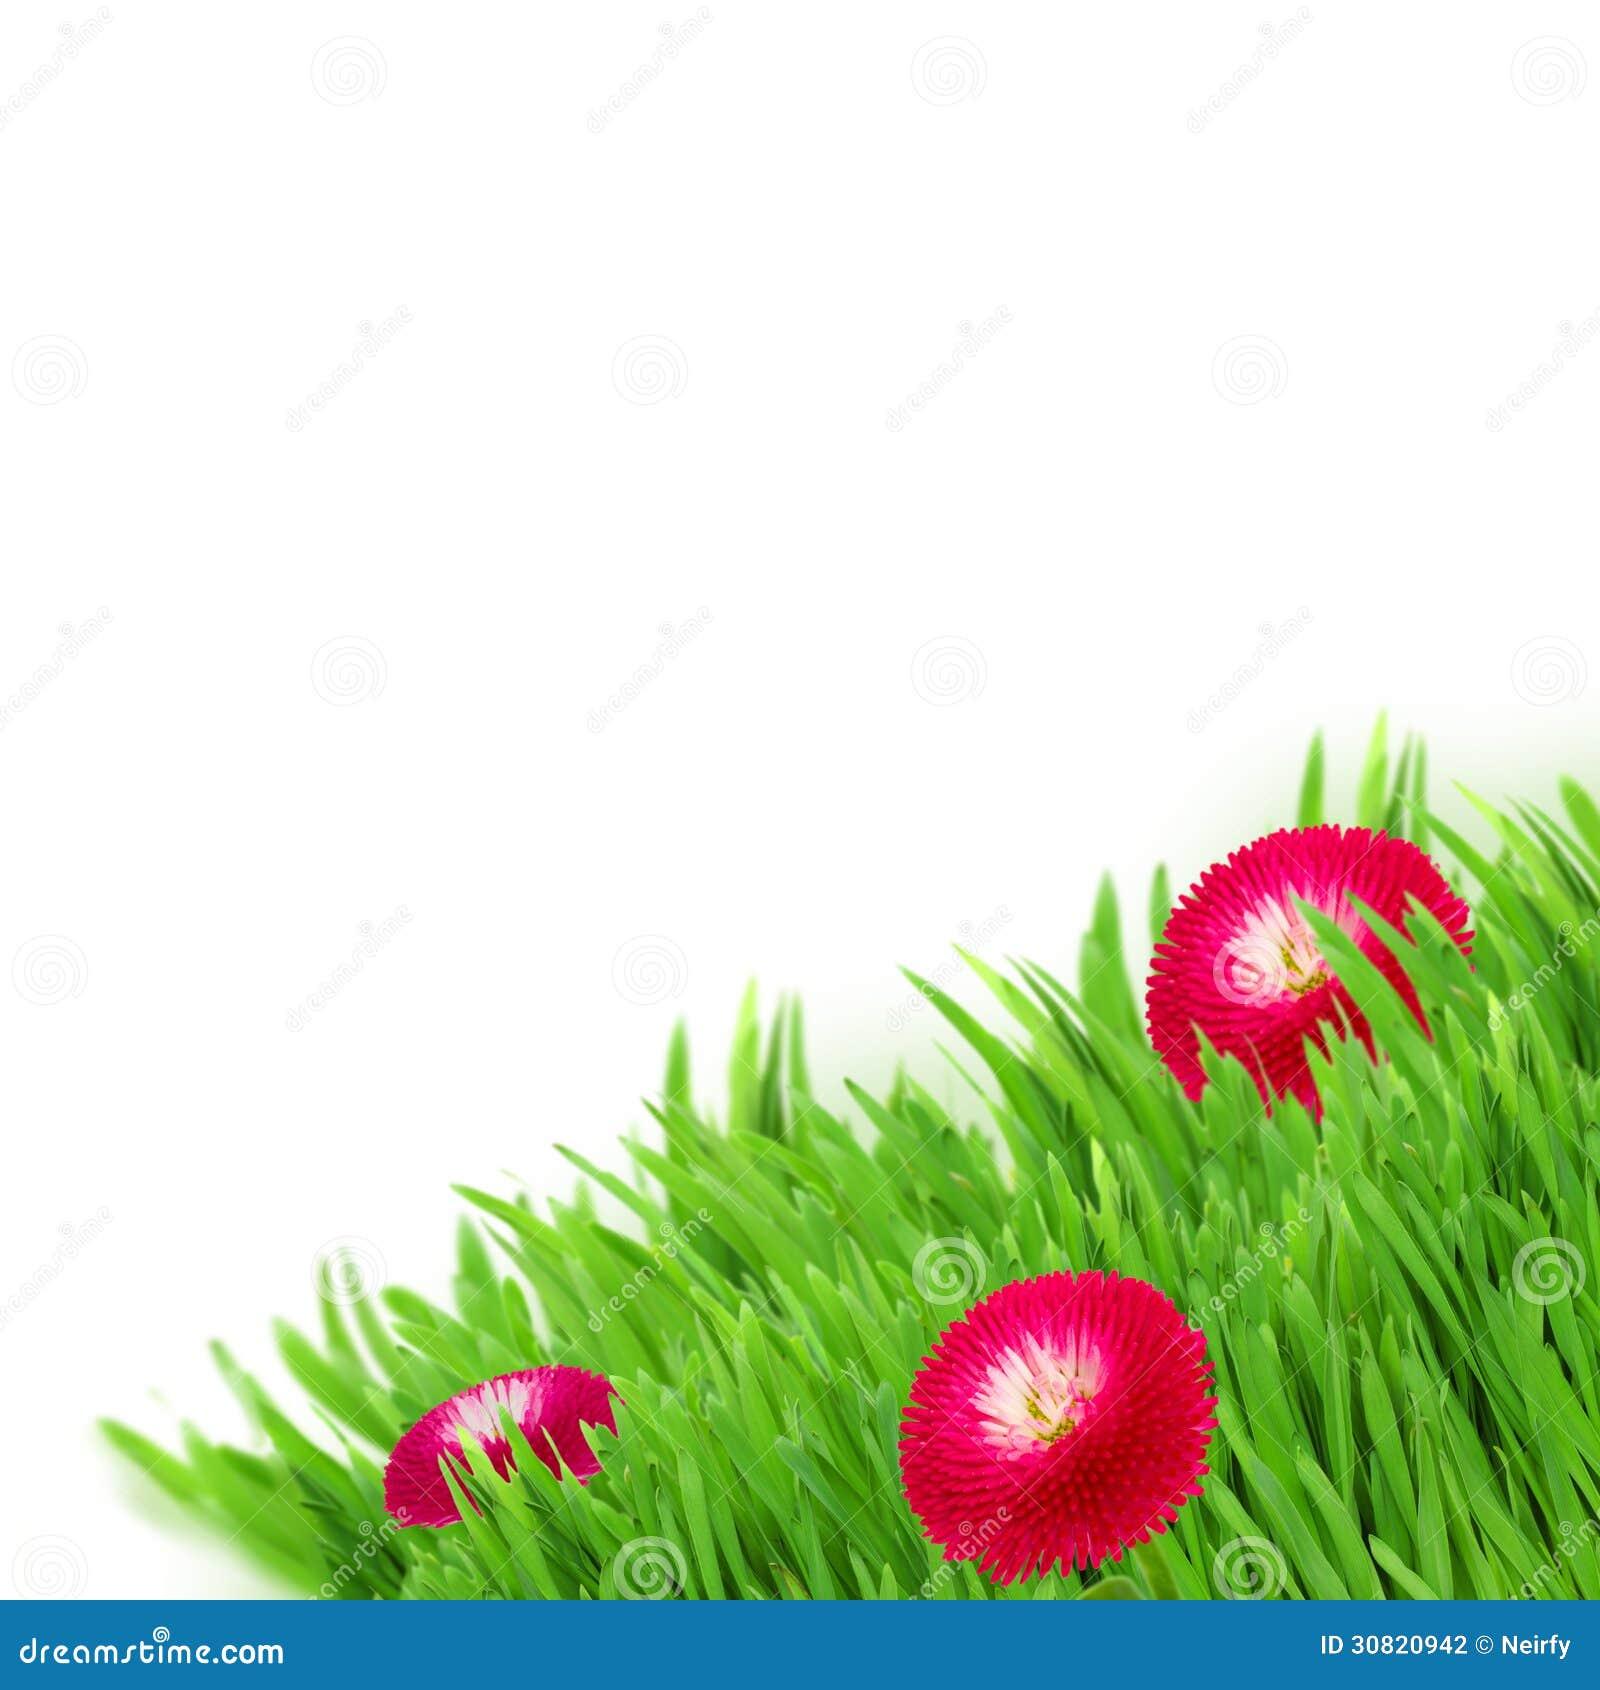 Green grass with daisy flowers border stock photo 30820942 megapixl green grass with daisy flowers border izmirmasajfo